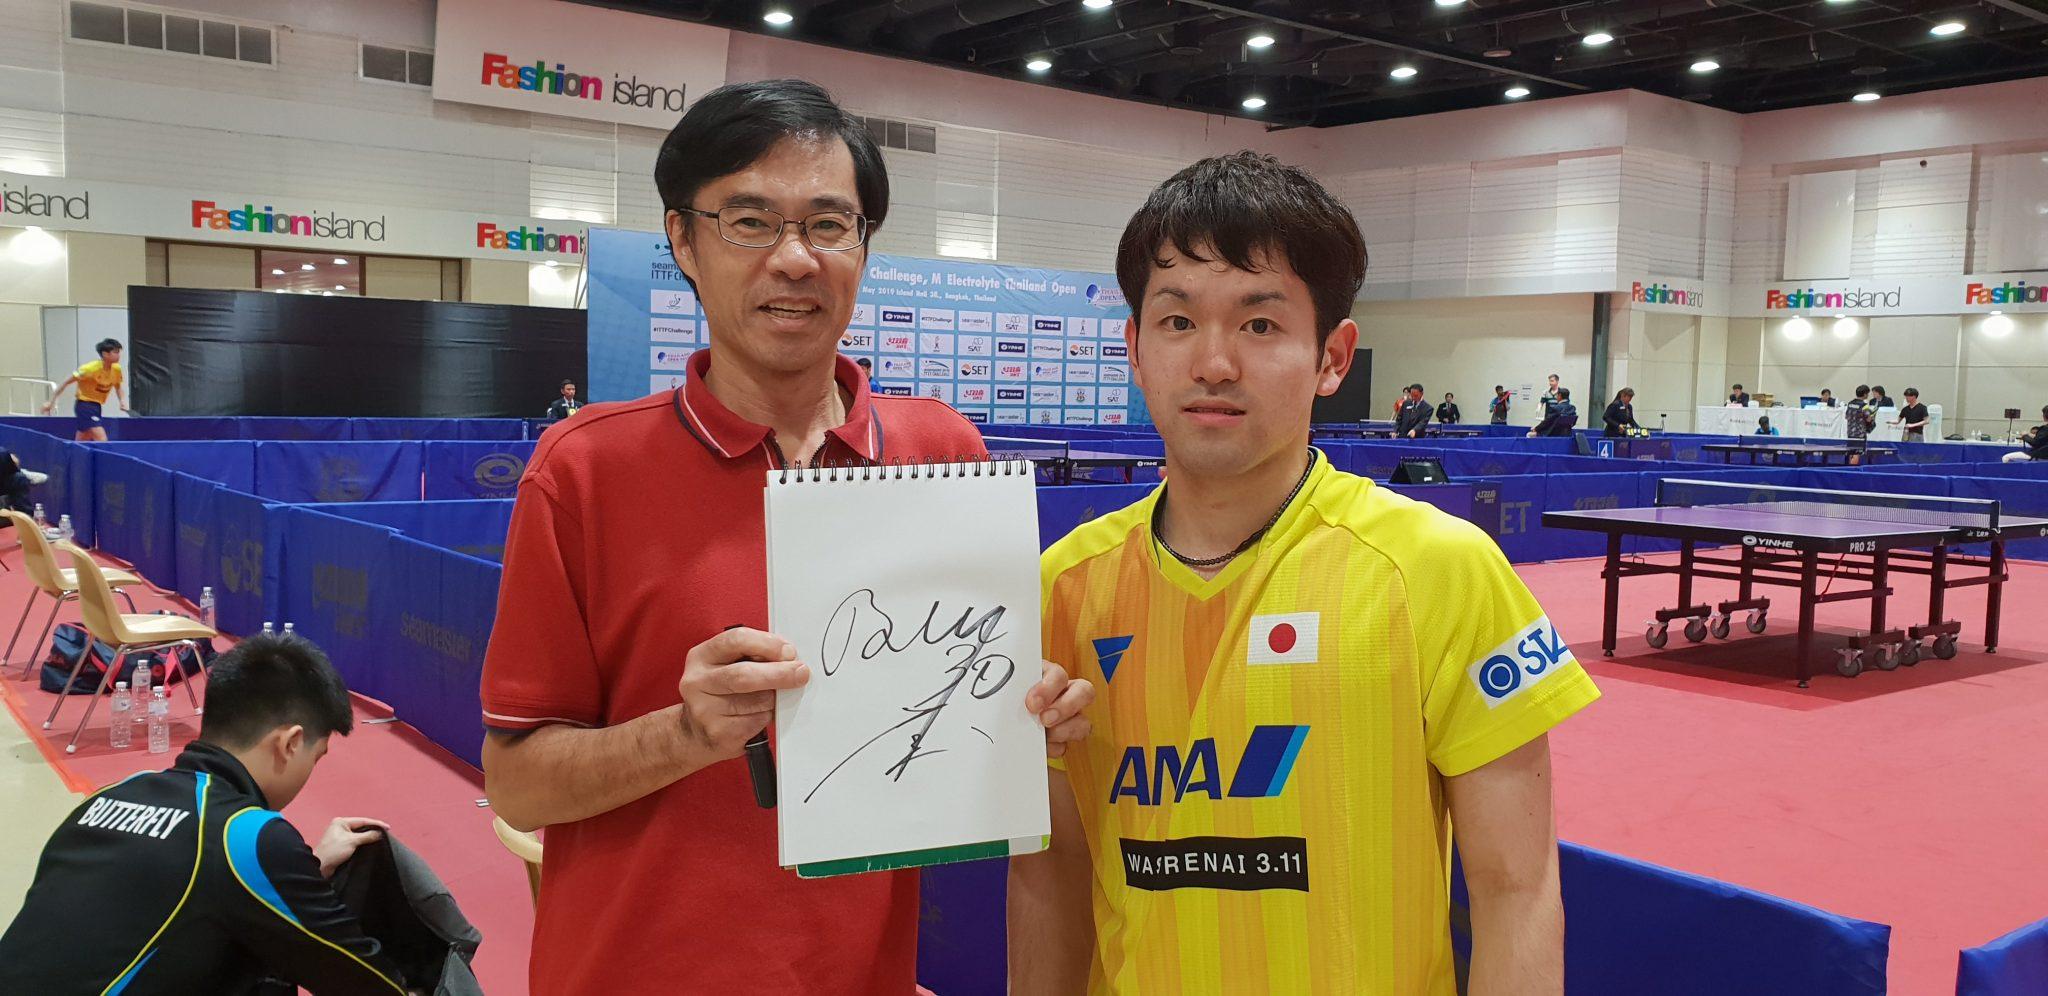 【ITTF ワールドツアー タイオープン】及川選手、キリアン選手ともに明日のベスト8決定戦へ!